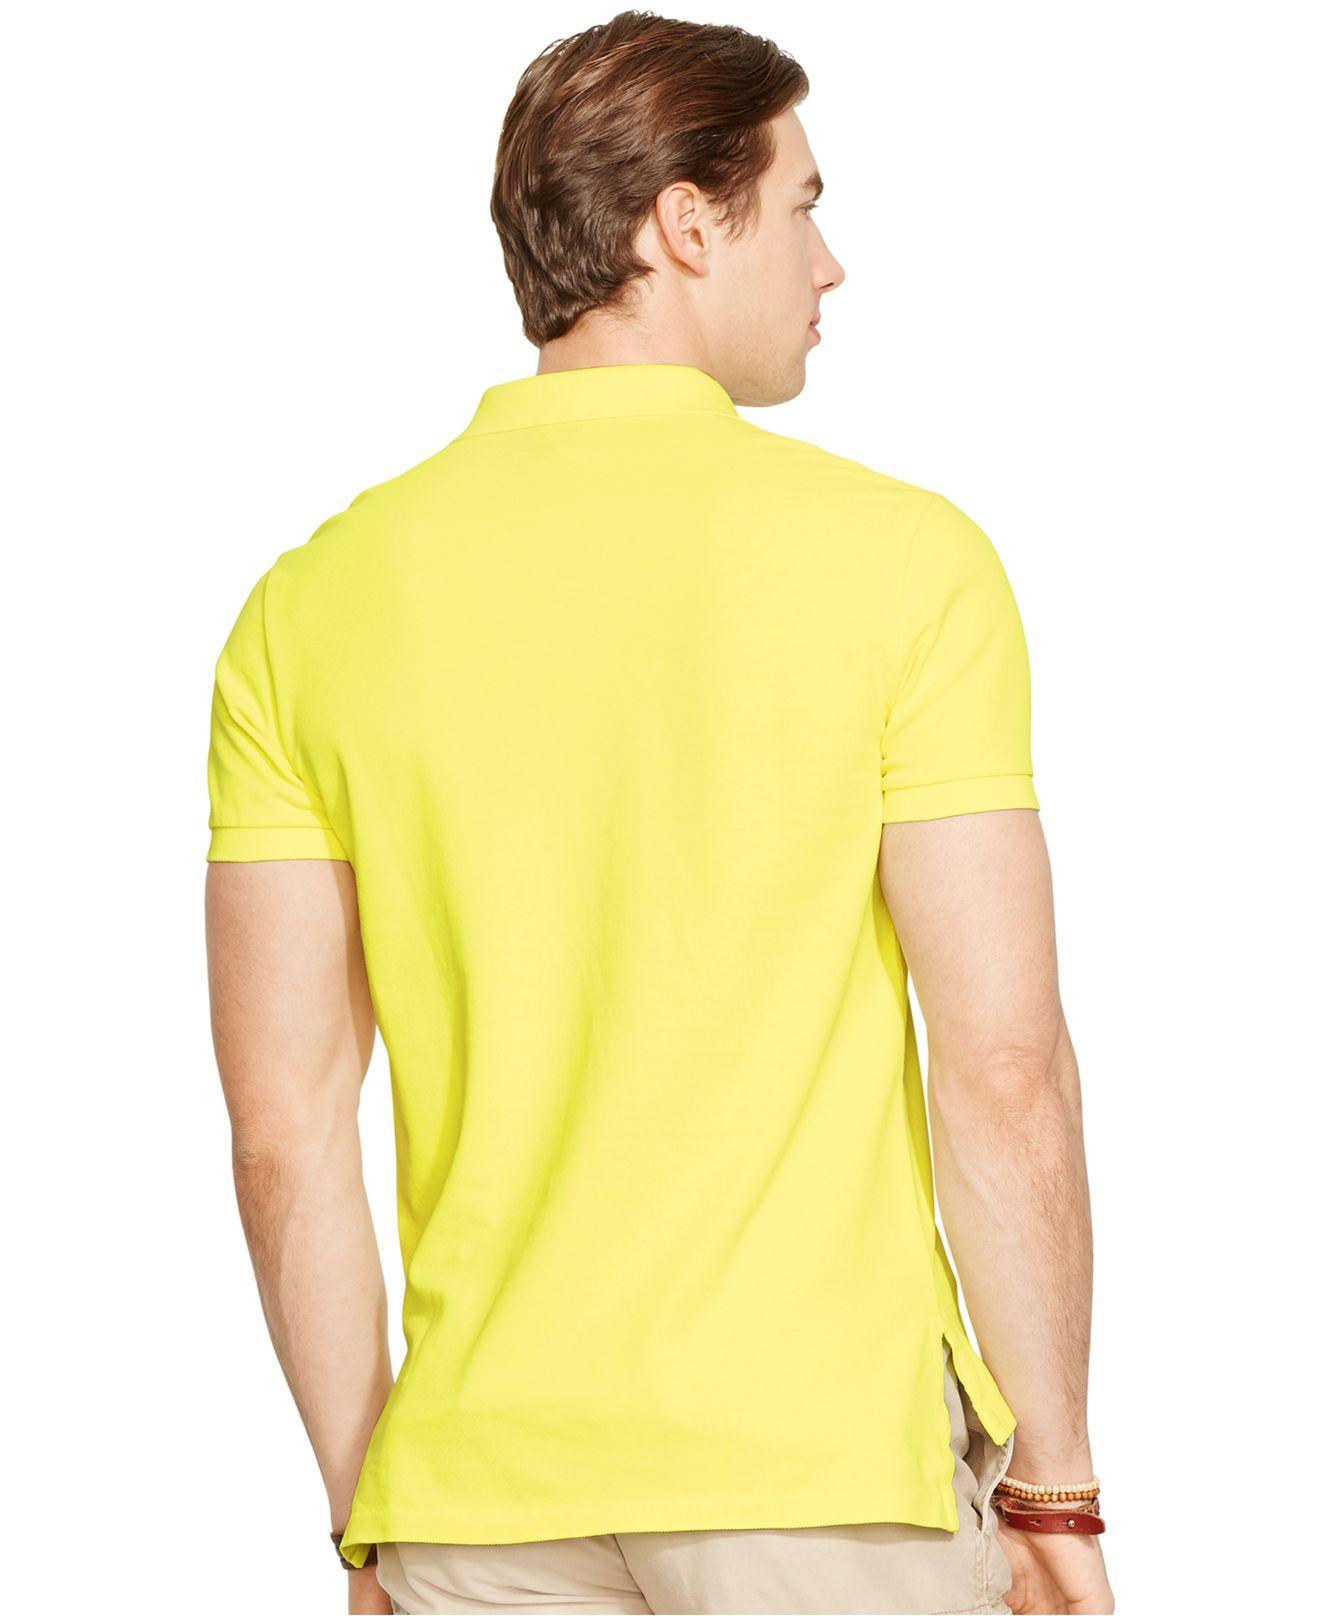 e98bfecf6f498 Lyst - Polo Ralph Lauren Custom-fit Neon Mesh Polo Shirt in Yellow ...